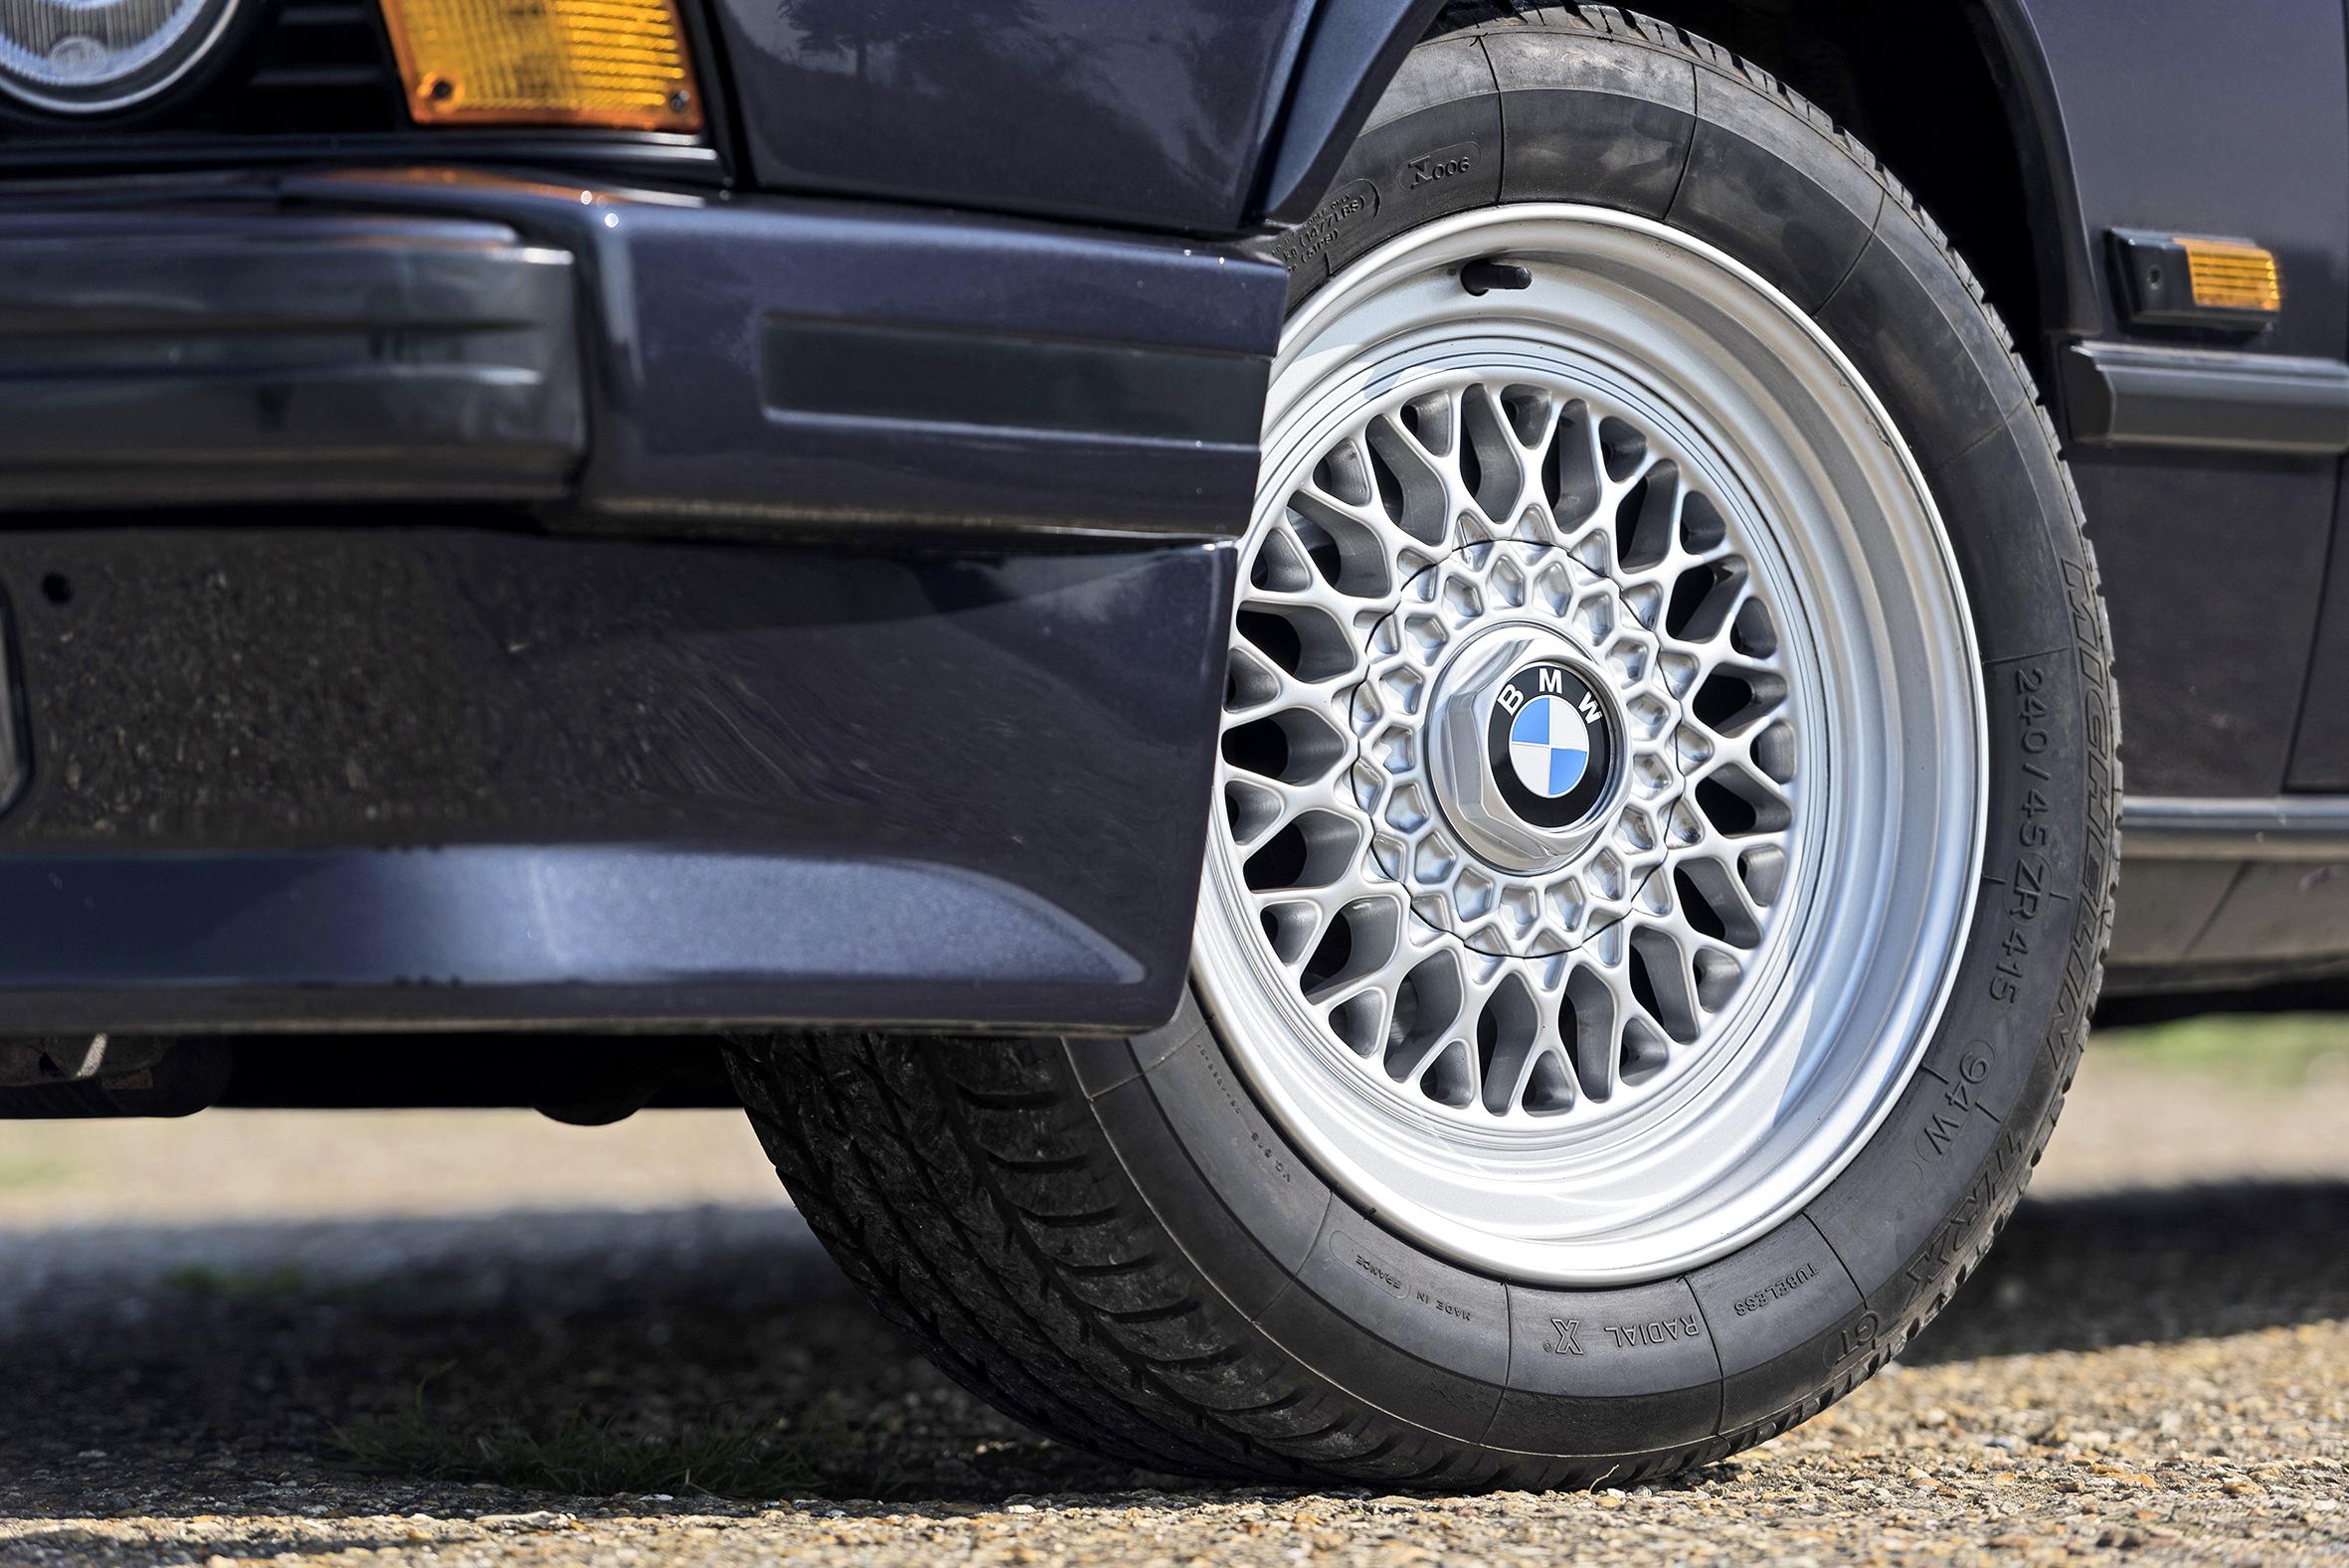 modernclassics-BMW-635i-Mercedes-E320-jordanbutters-26.jpg